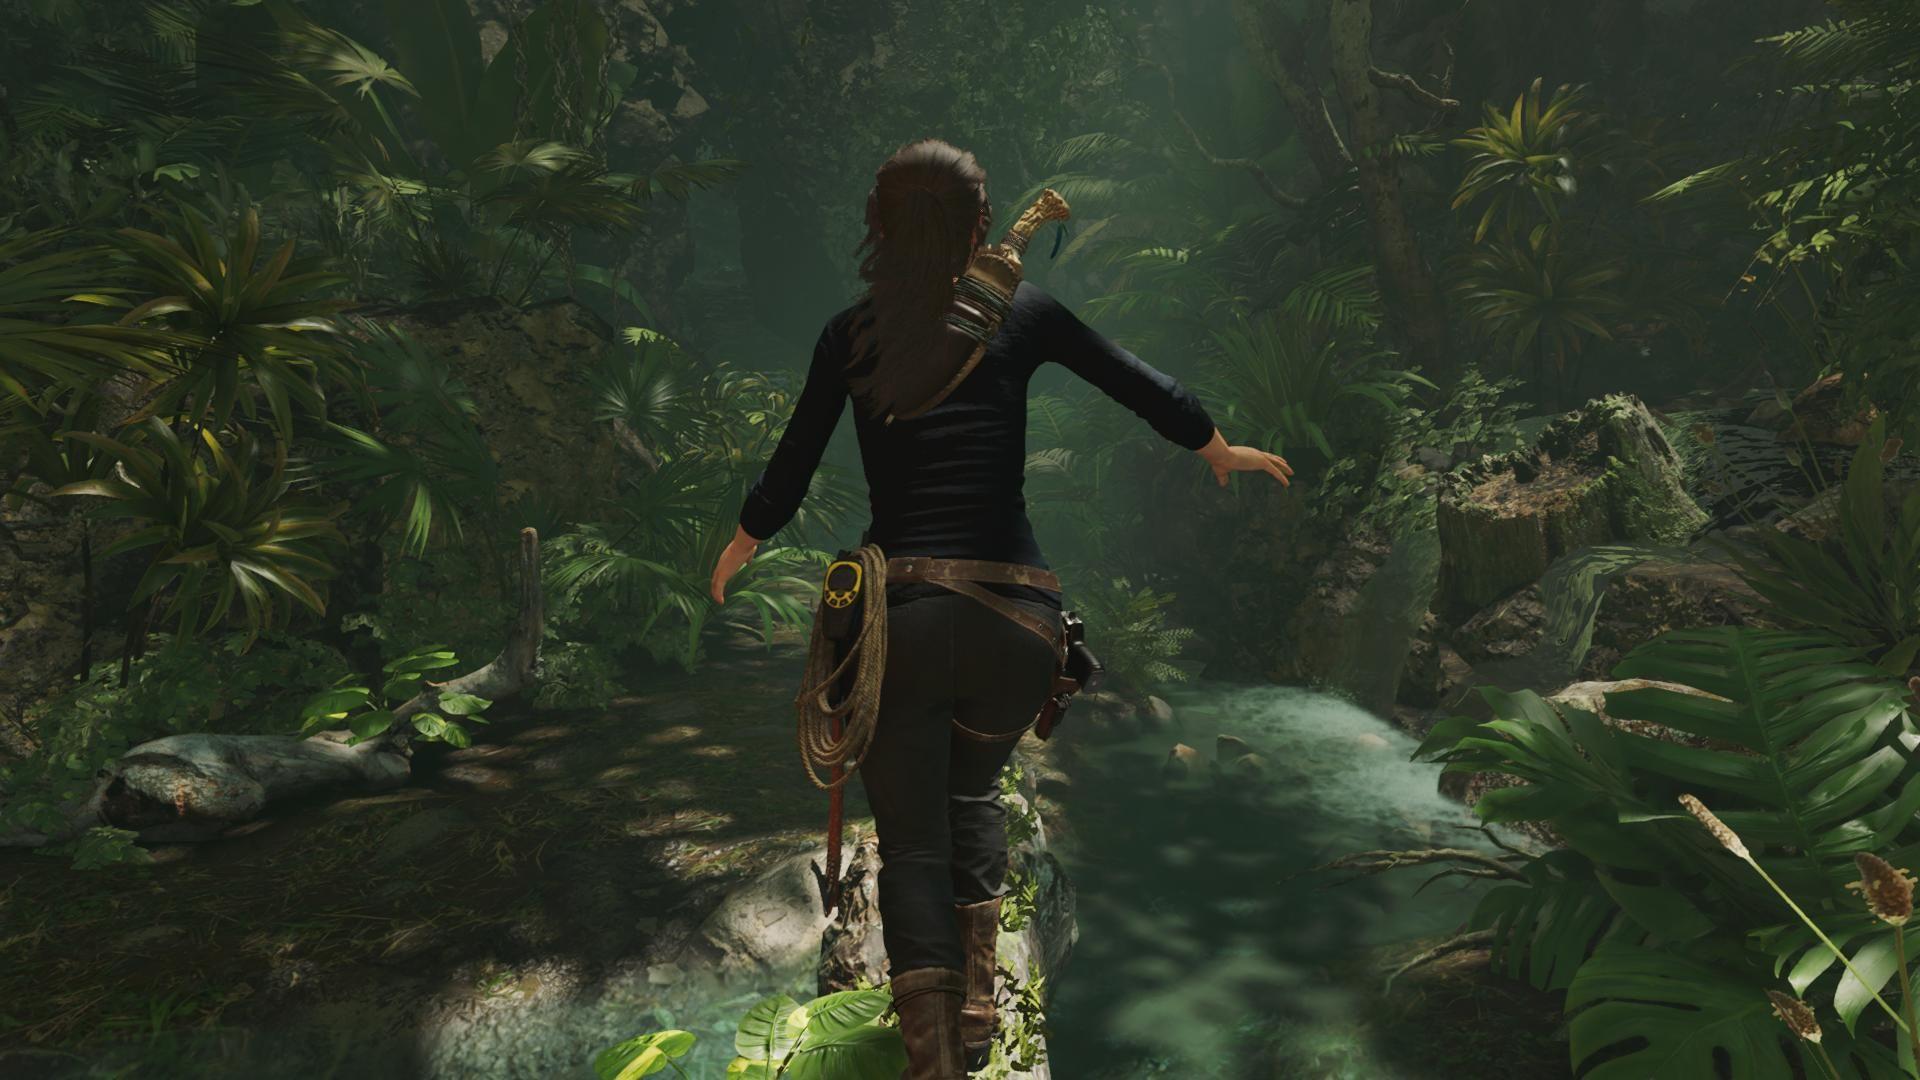 Shadow of the Tomb Raider DLC - Shadow of the Tomb Raider